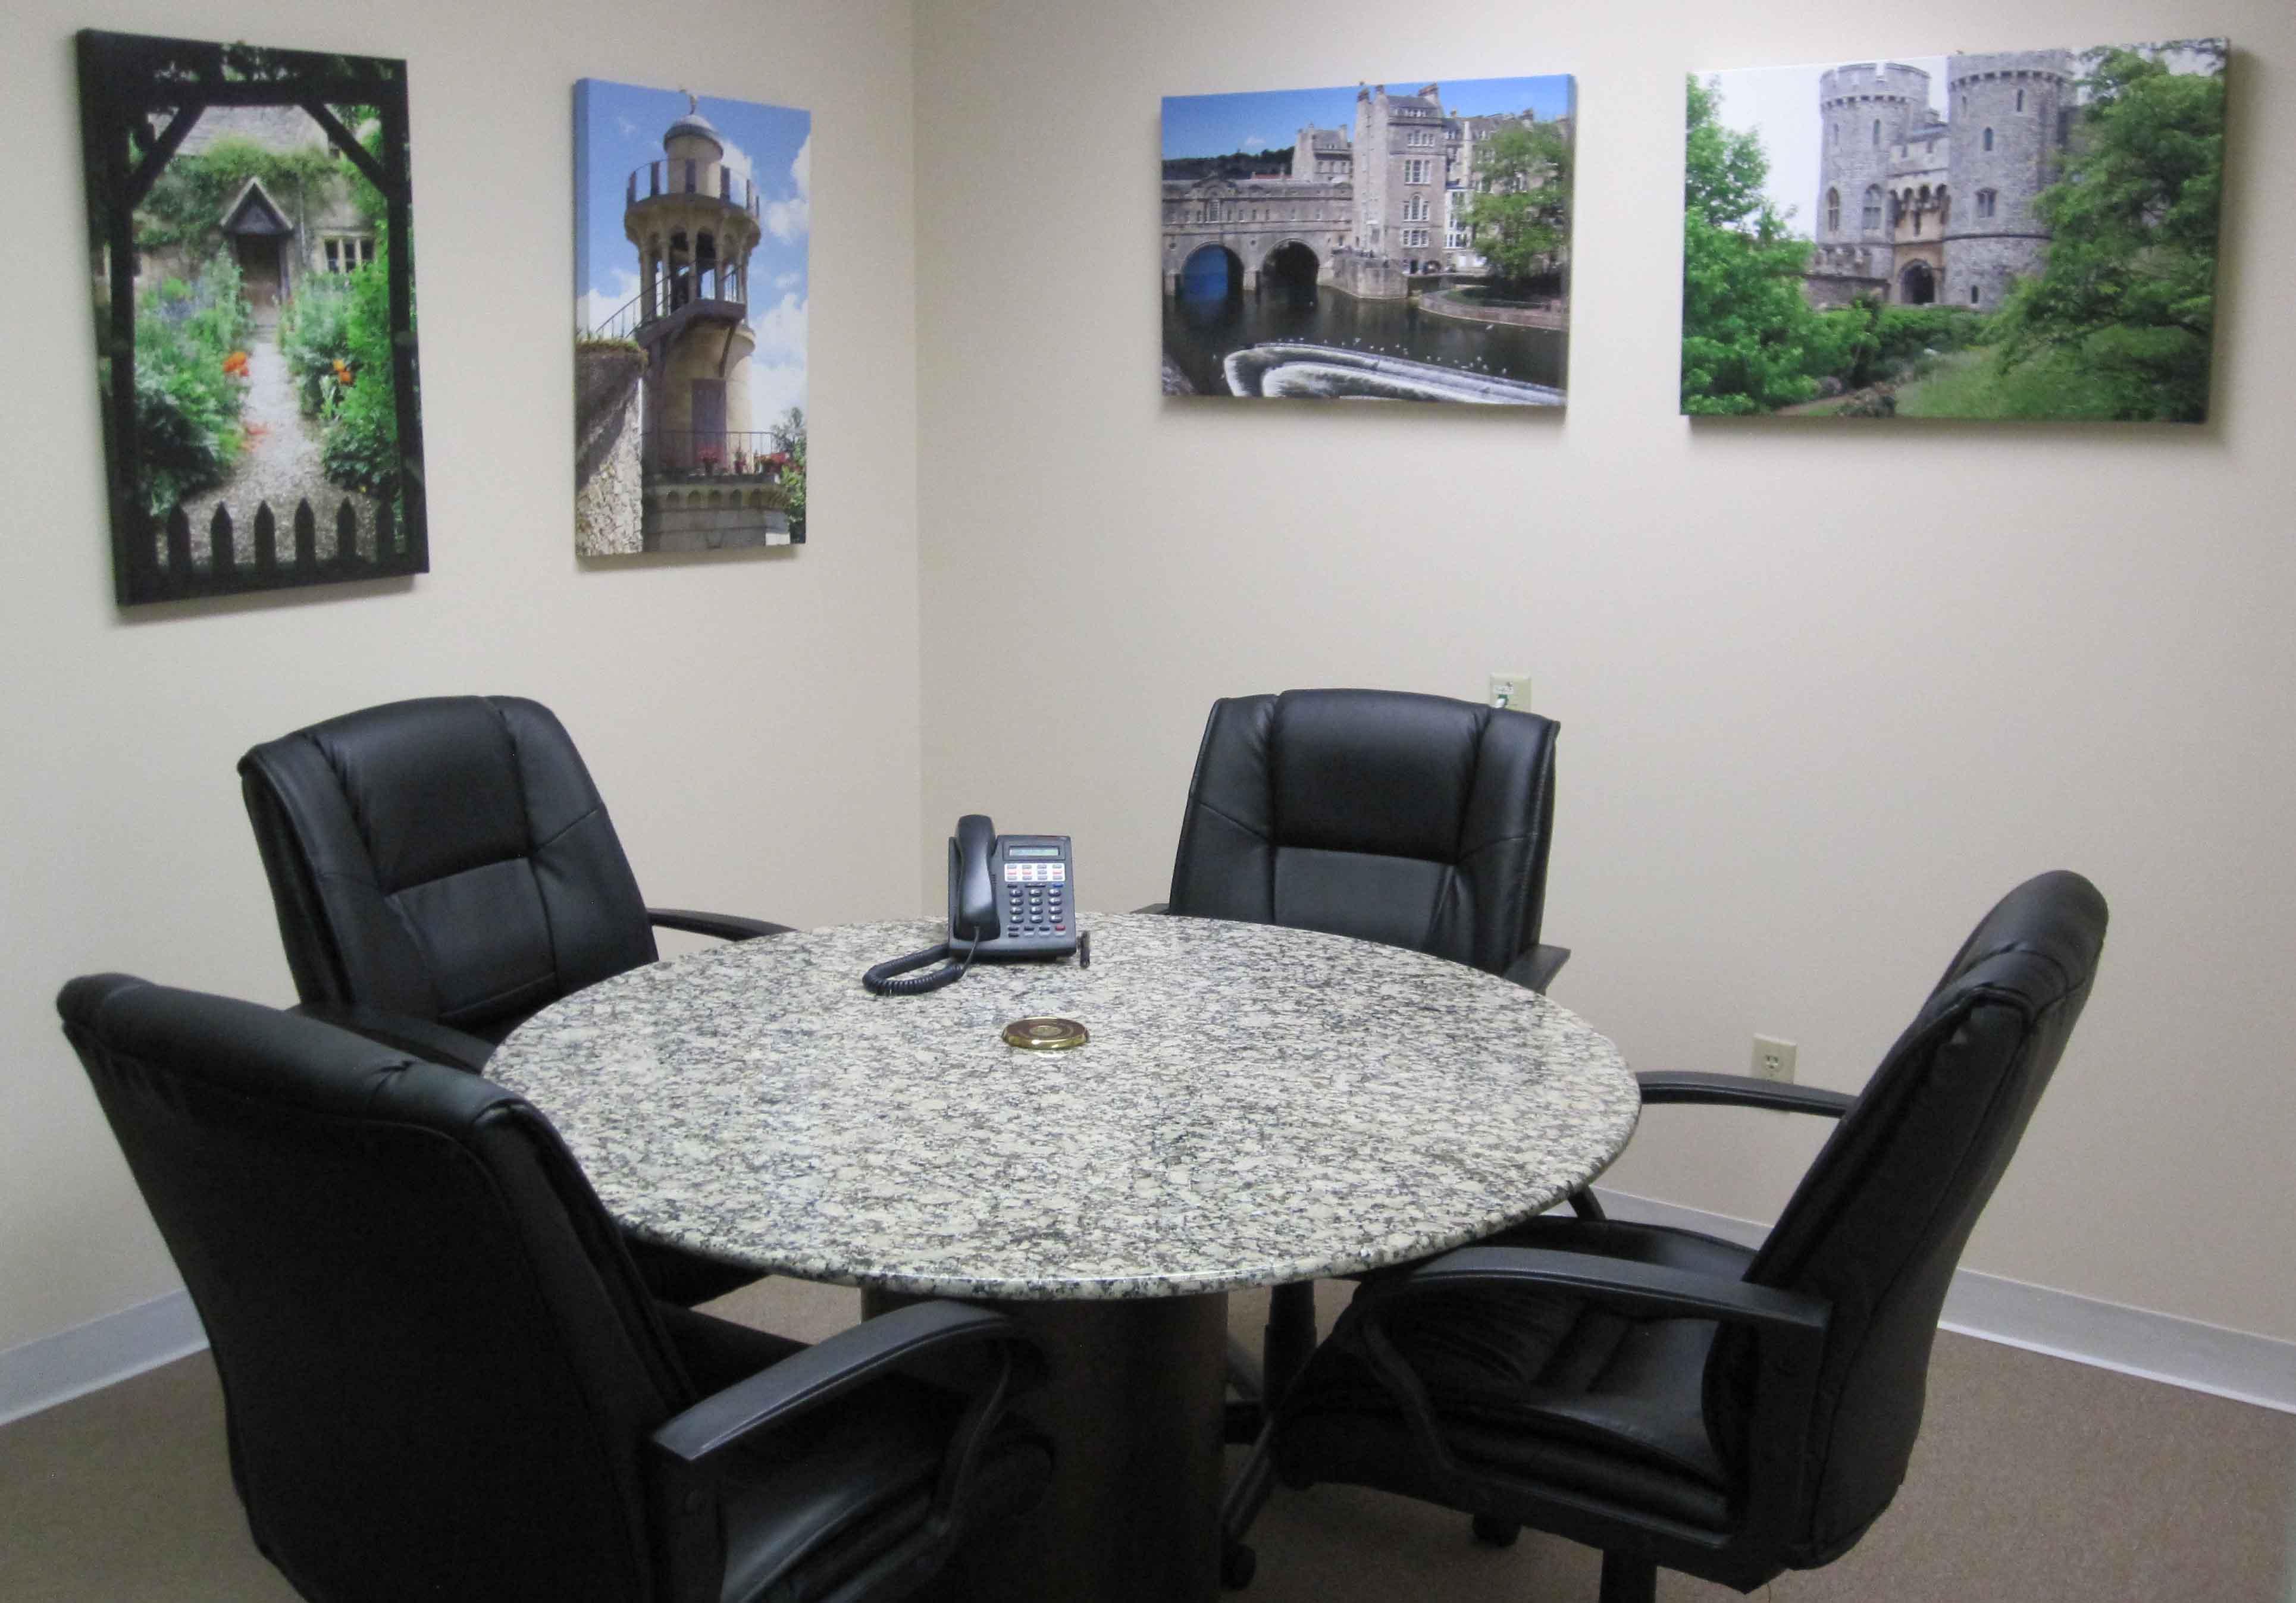 Business Valuation | Capital Advisors, Inc. | St. Louis, Missouri